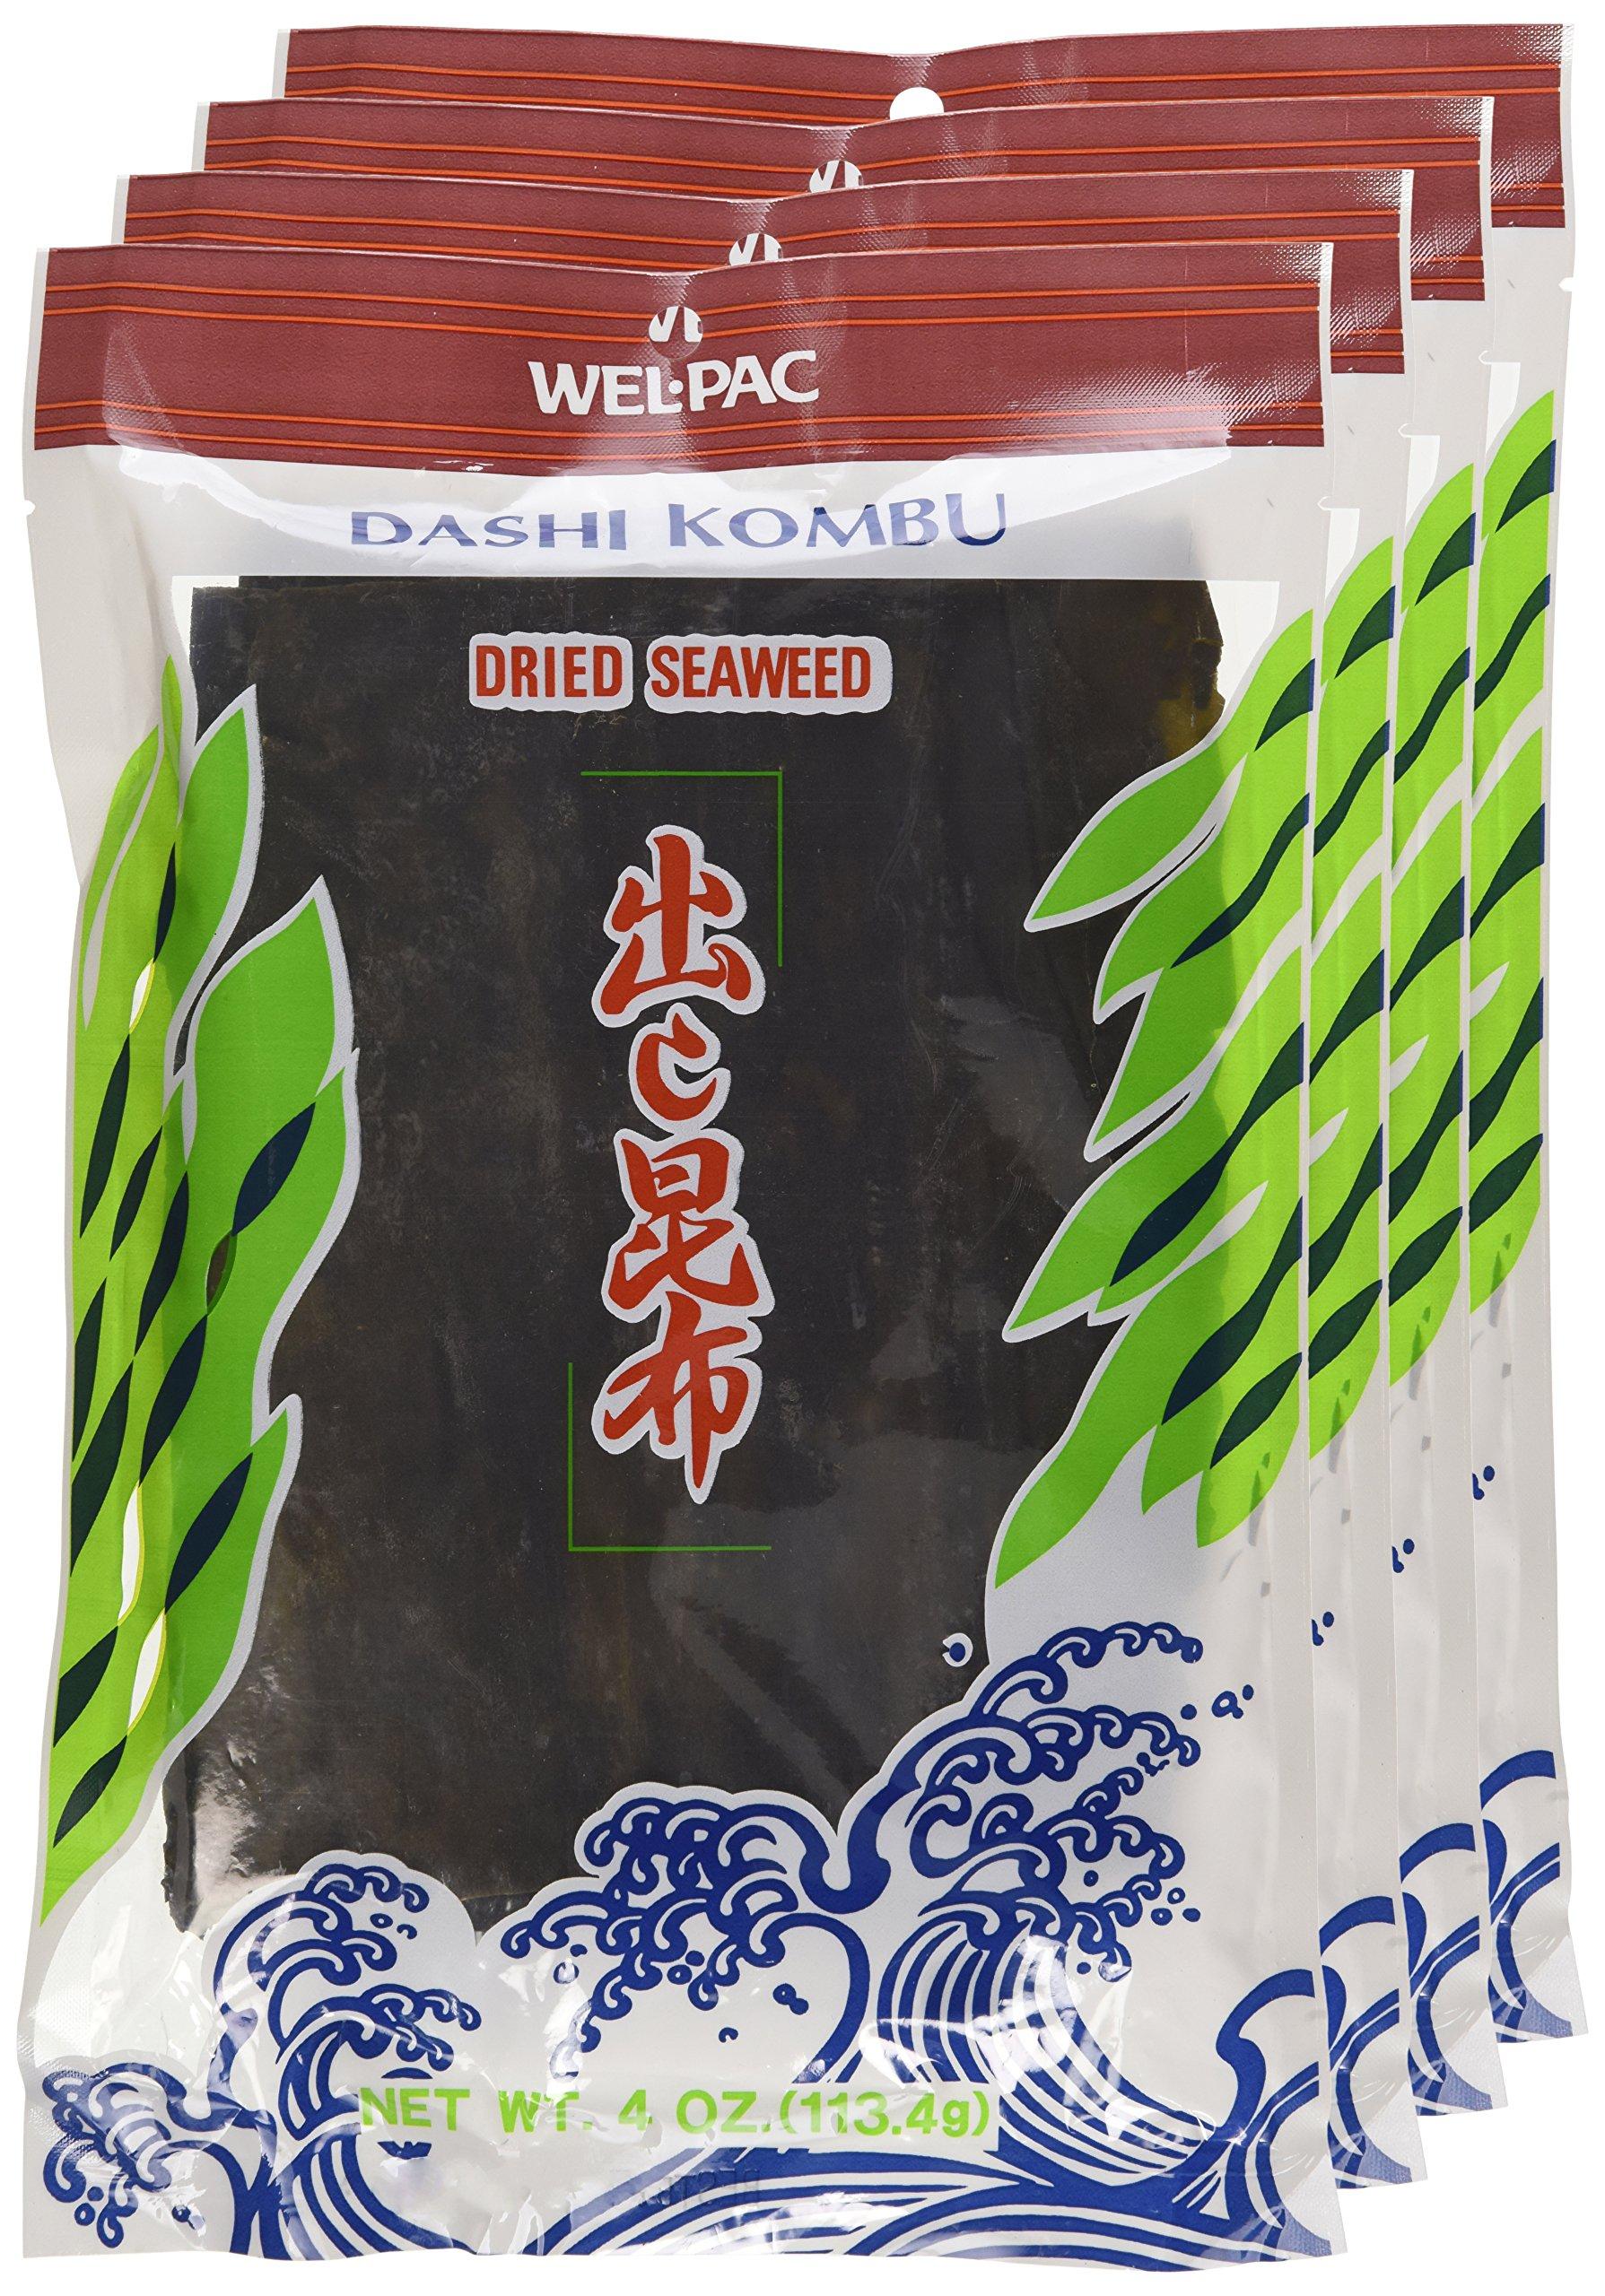 Wel-pac Dashi Kombu Dried Seaweed (Pack of 4)  by Wel-Pac (Image #2)